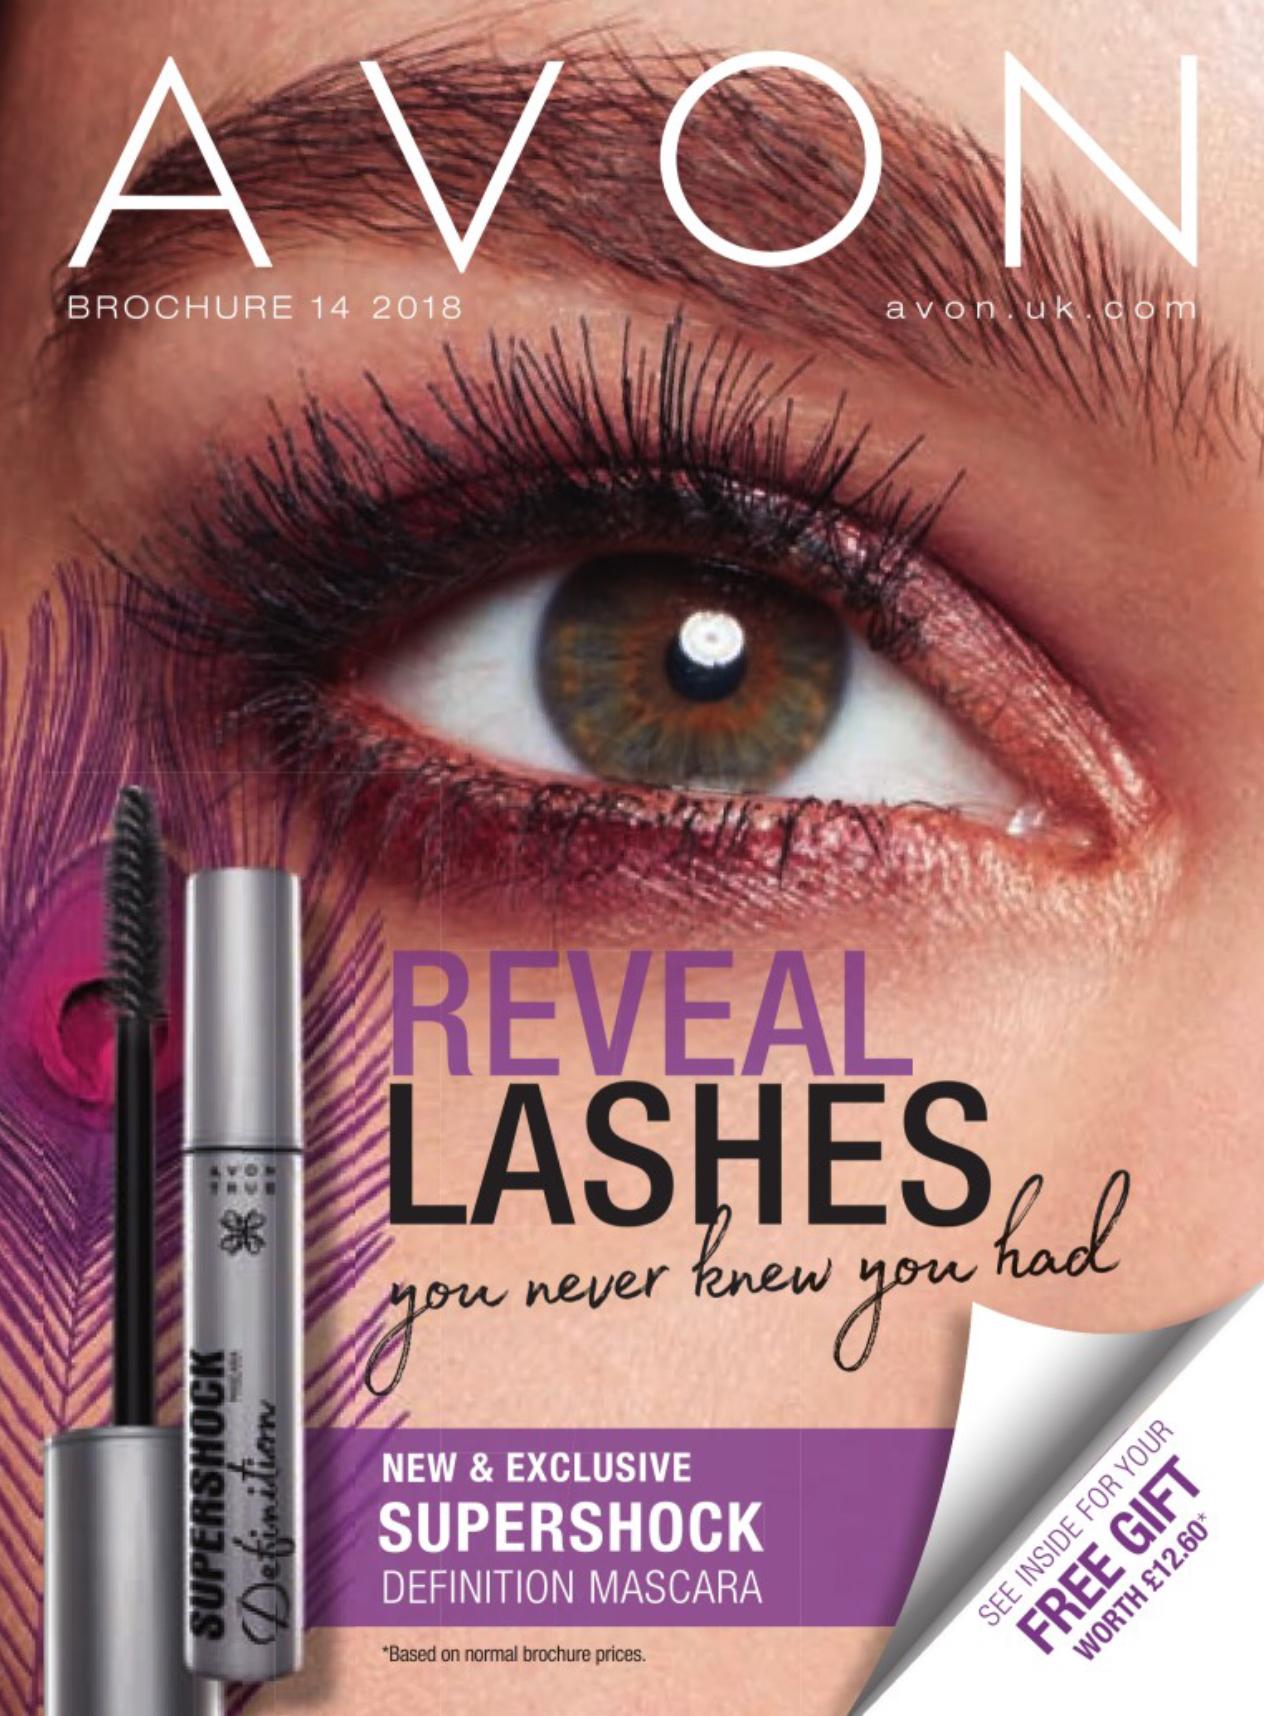 Avon Campaign 14 2018 UK Brochure Online